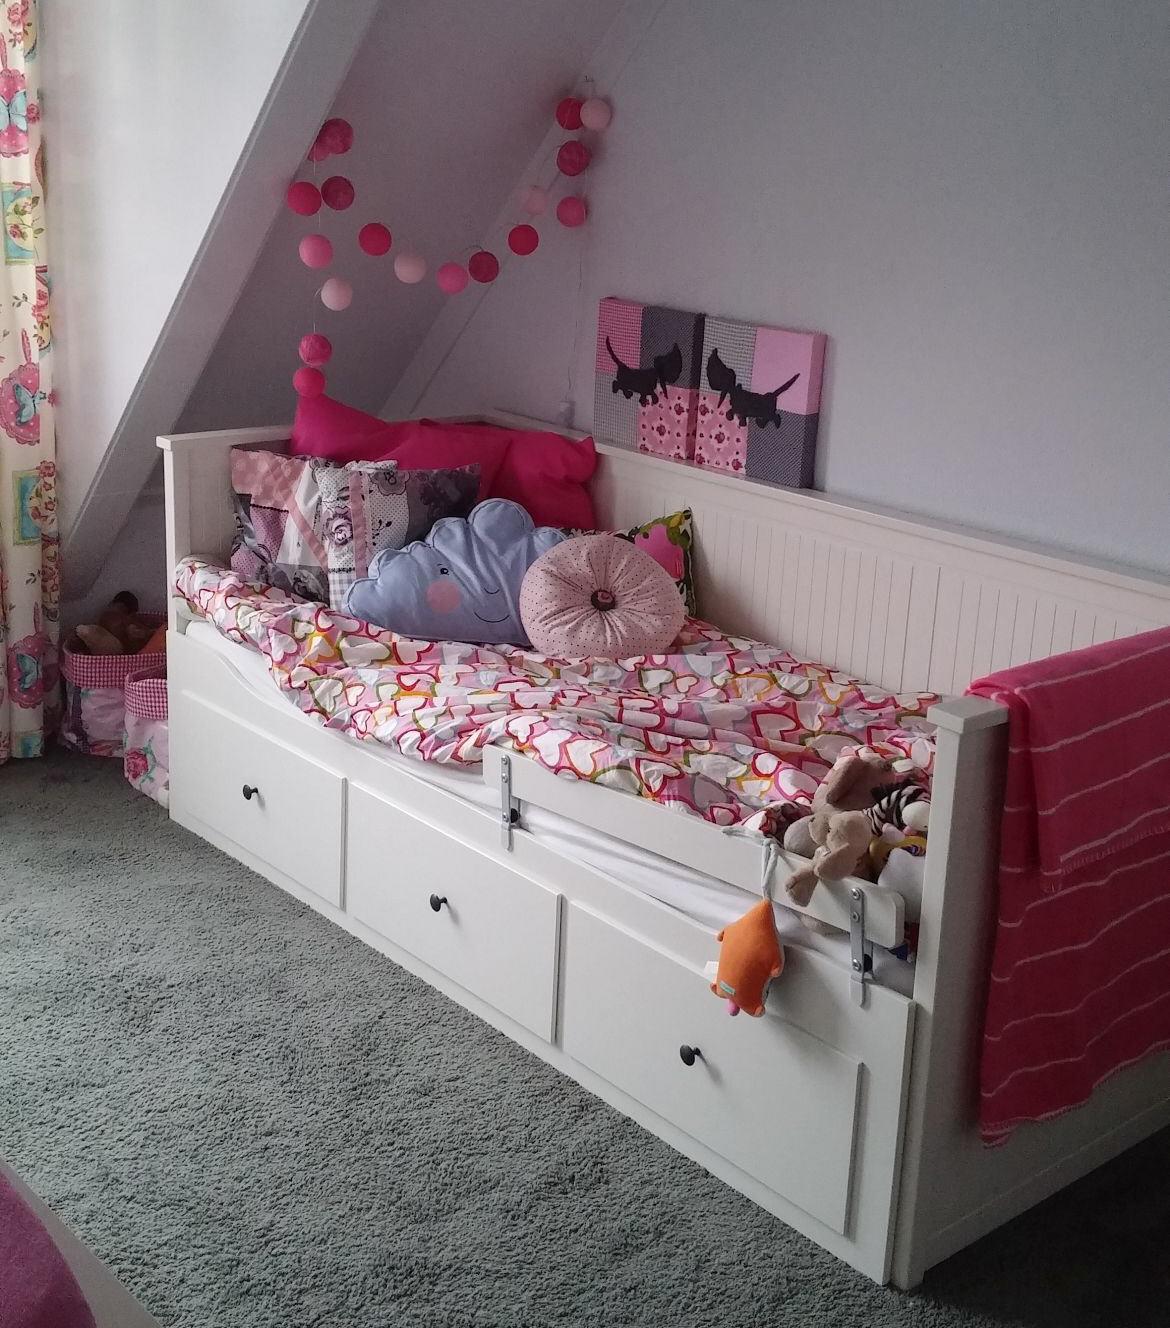 Peuterbed Of Groot Bed.Ikea Hemnes Kamer Mama Dilemma Peuter Naar Een Peuterbed Of Groot